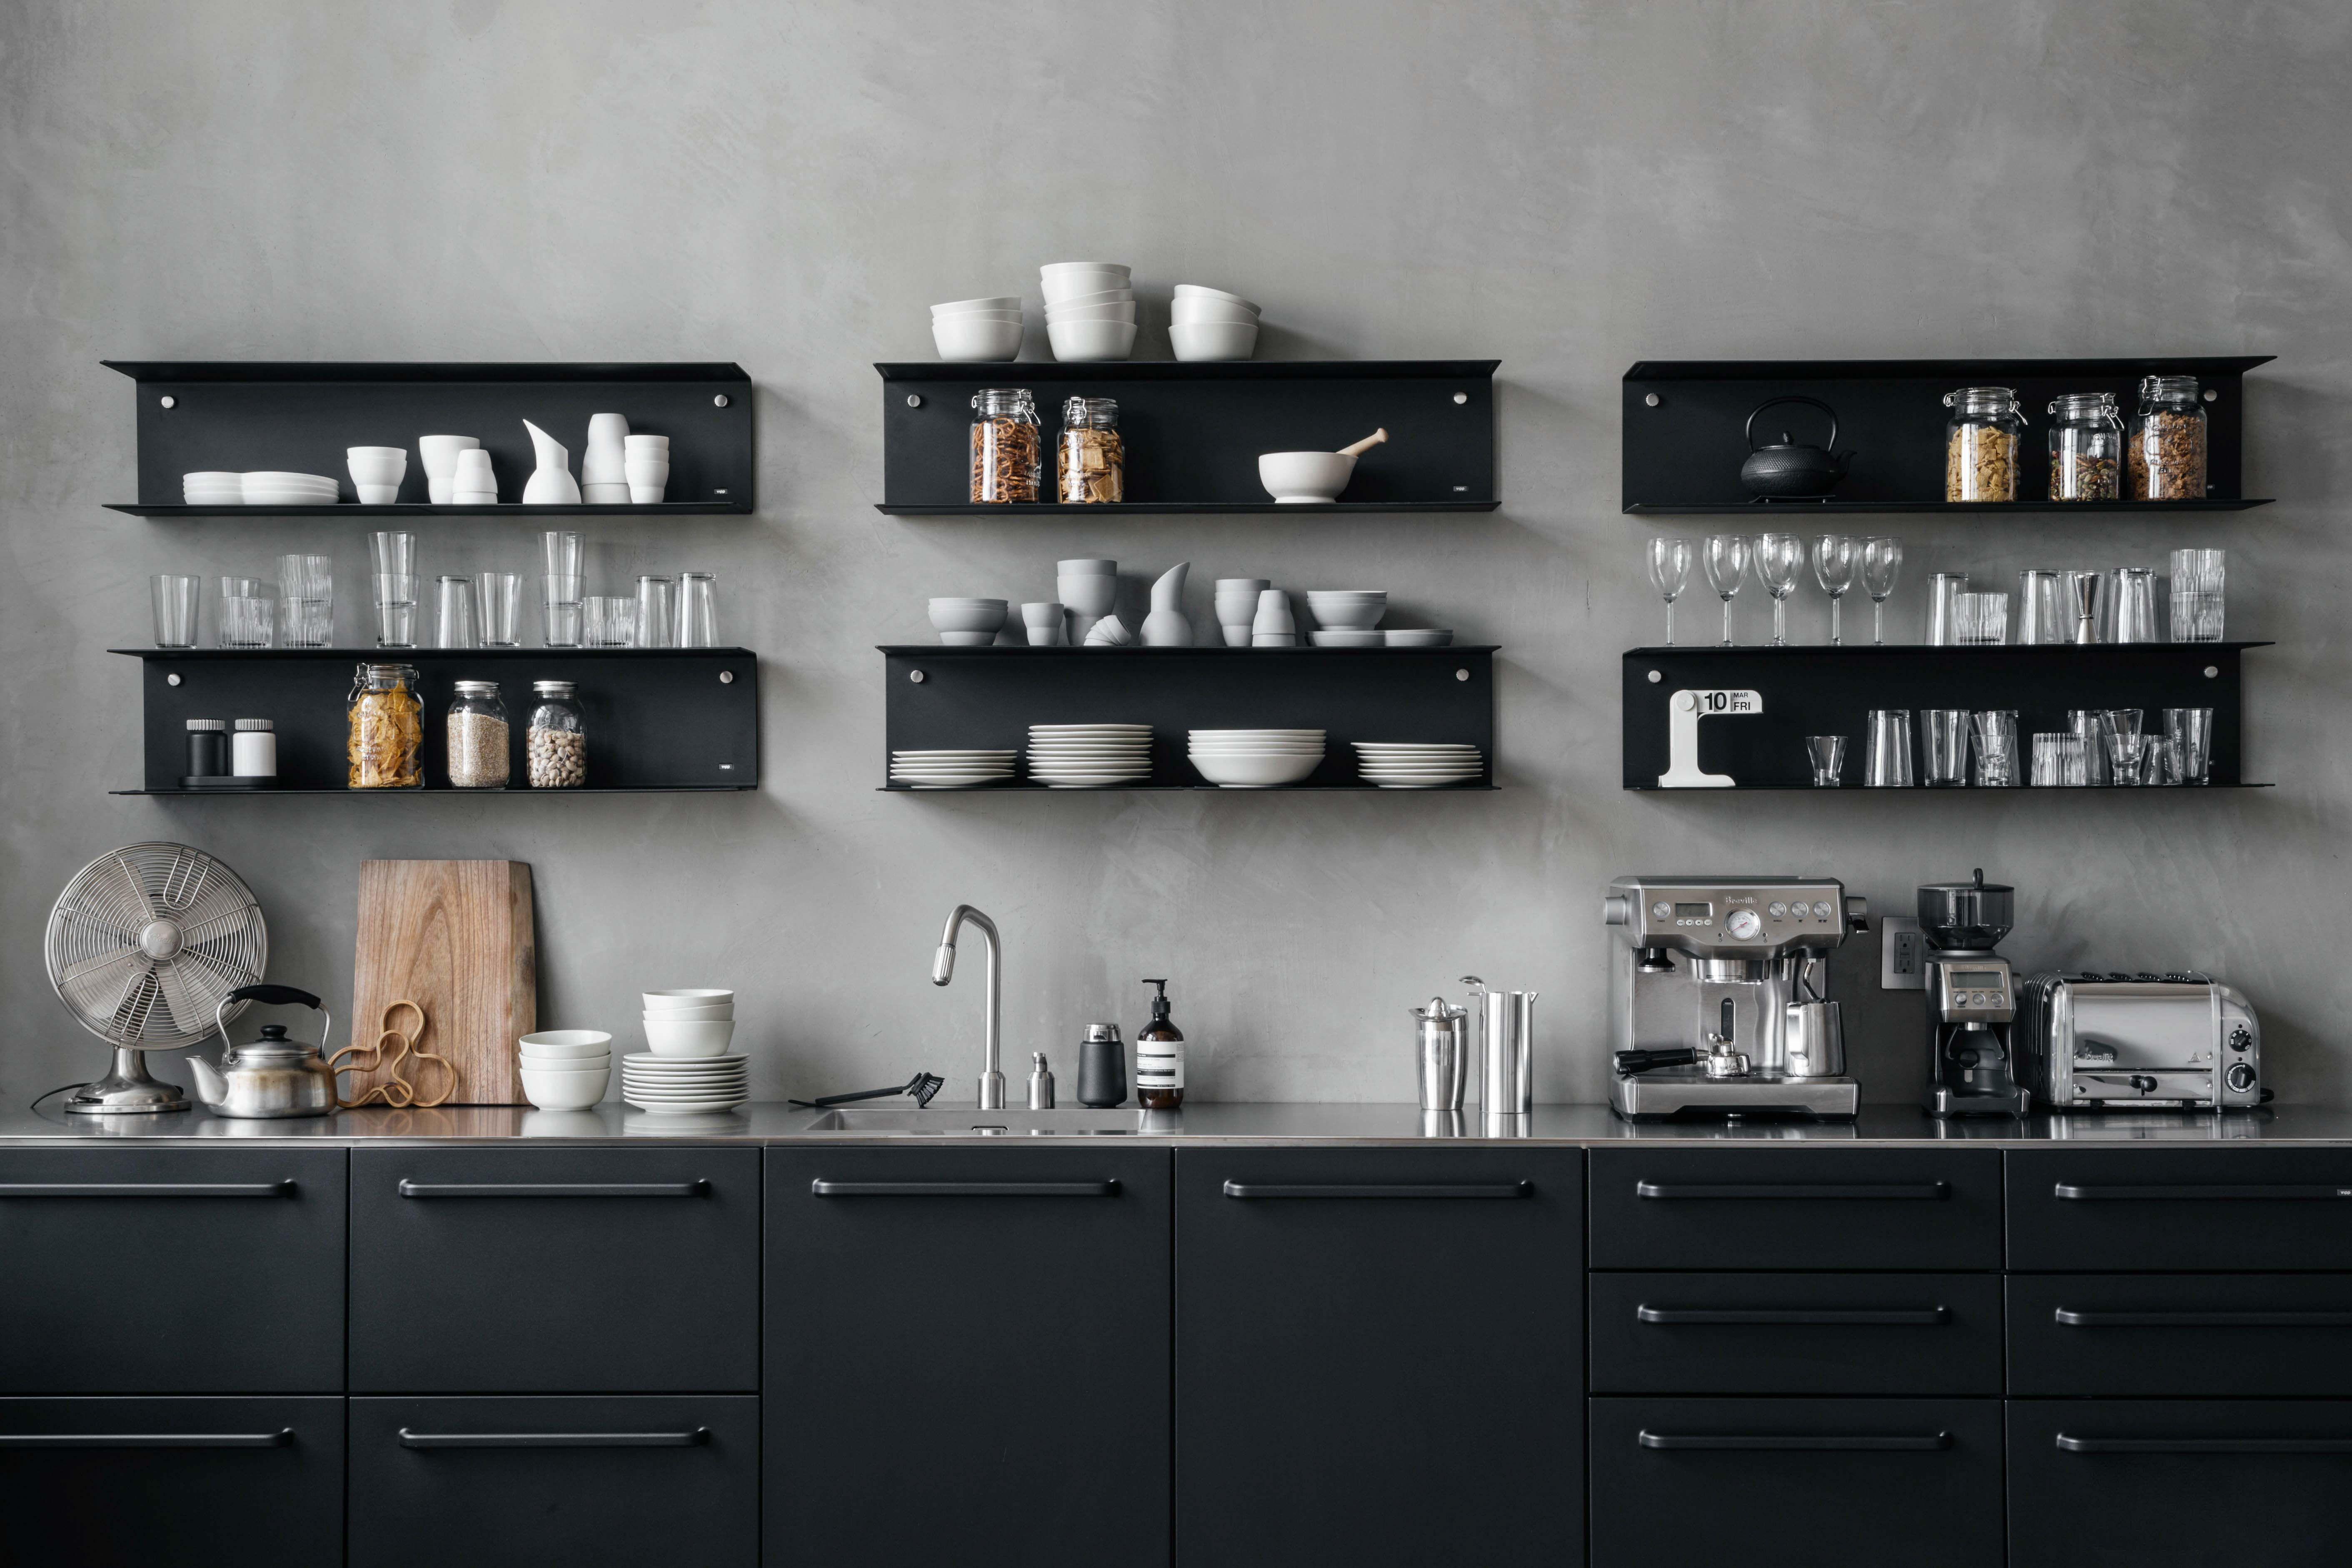 Vipp Black Kitchen In An Advertsing Agency Studio In Manhattan Used For Creative Pauses And Coffee Refill Kuche Freistehend Innenarchitektur Kuche Kuchendesign